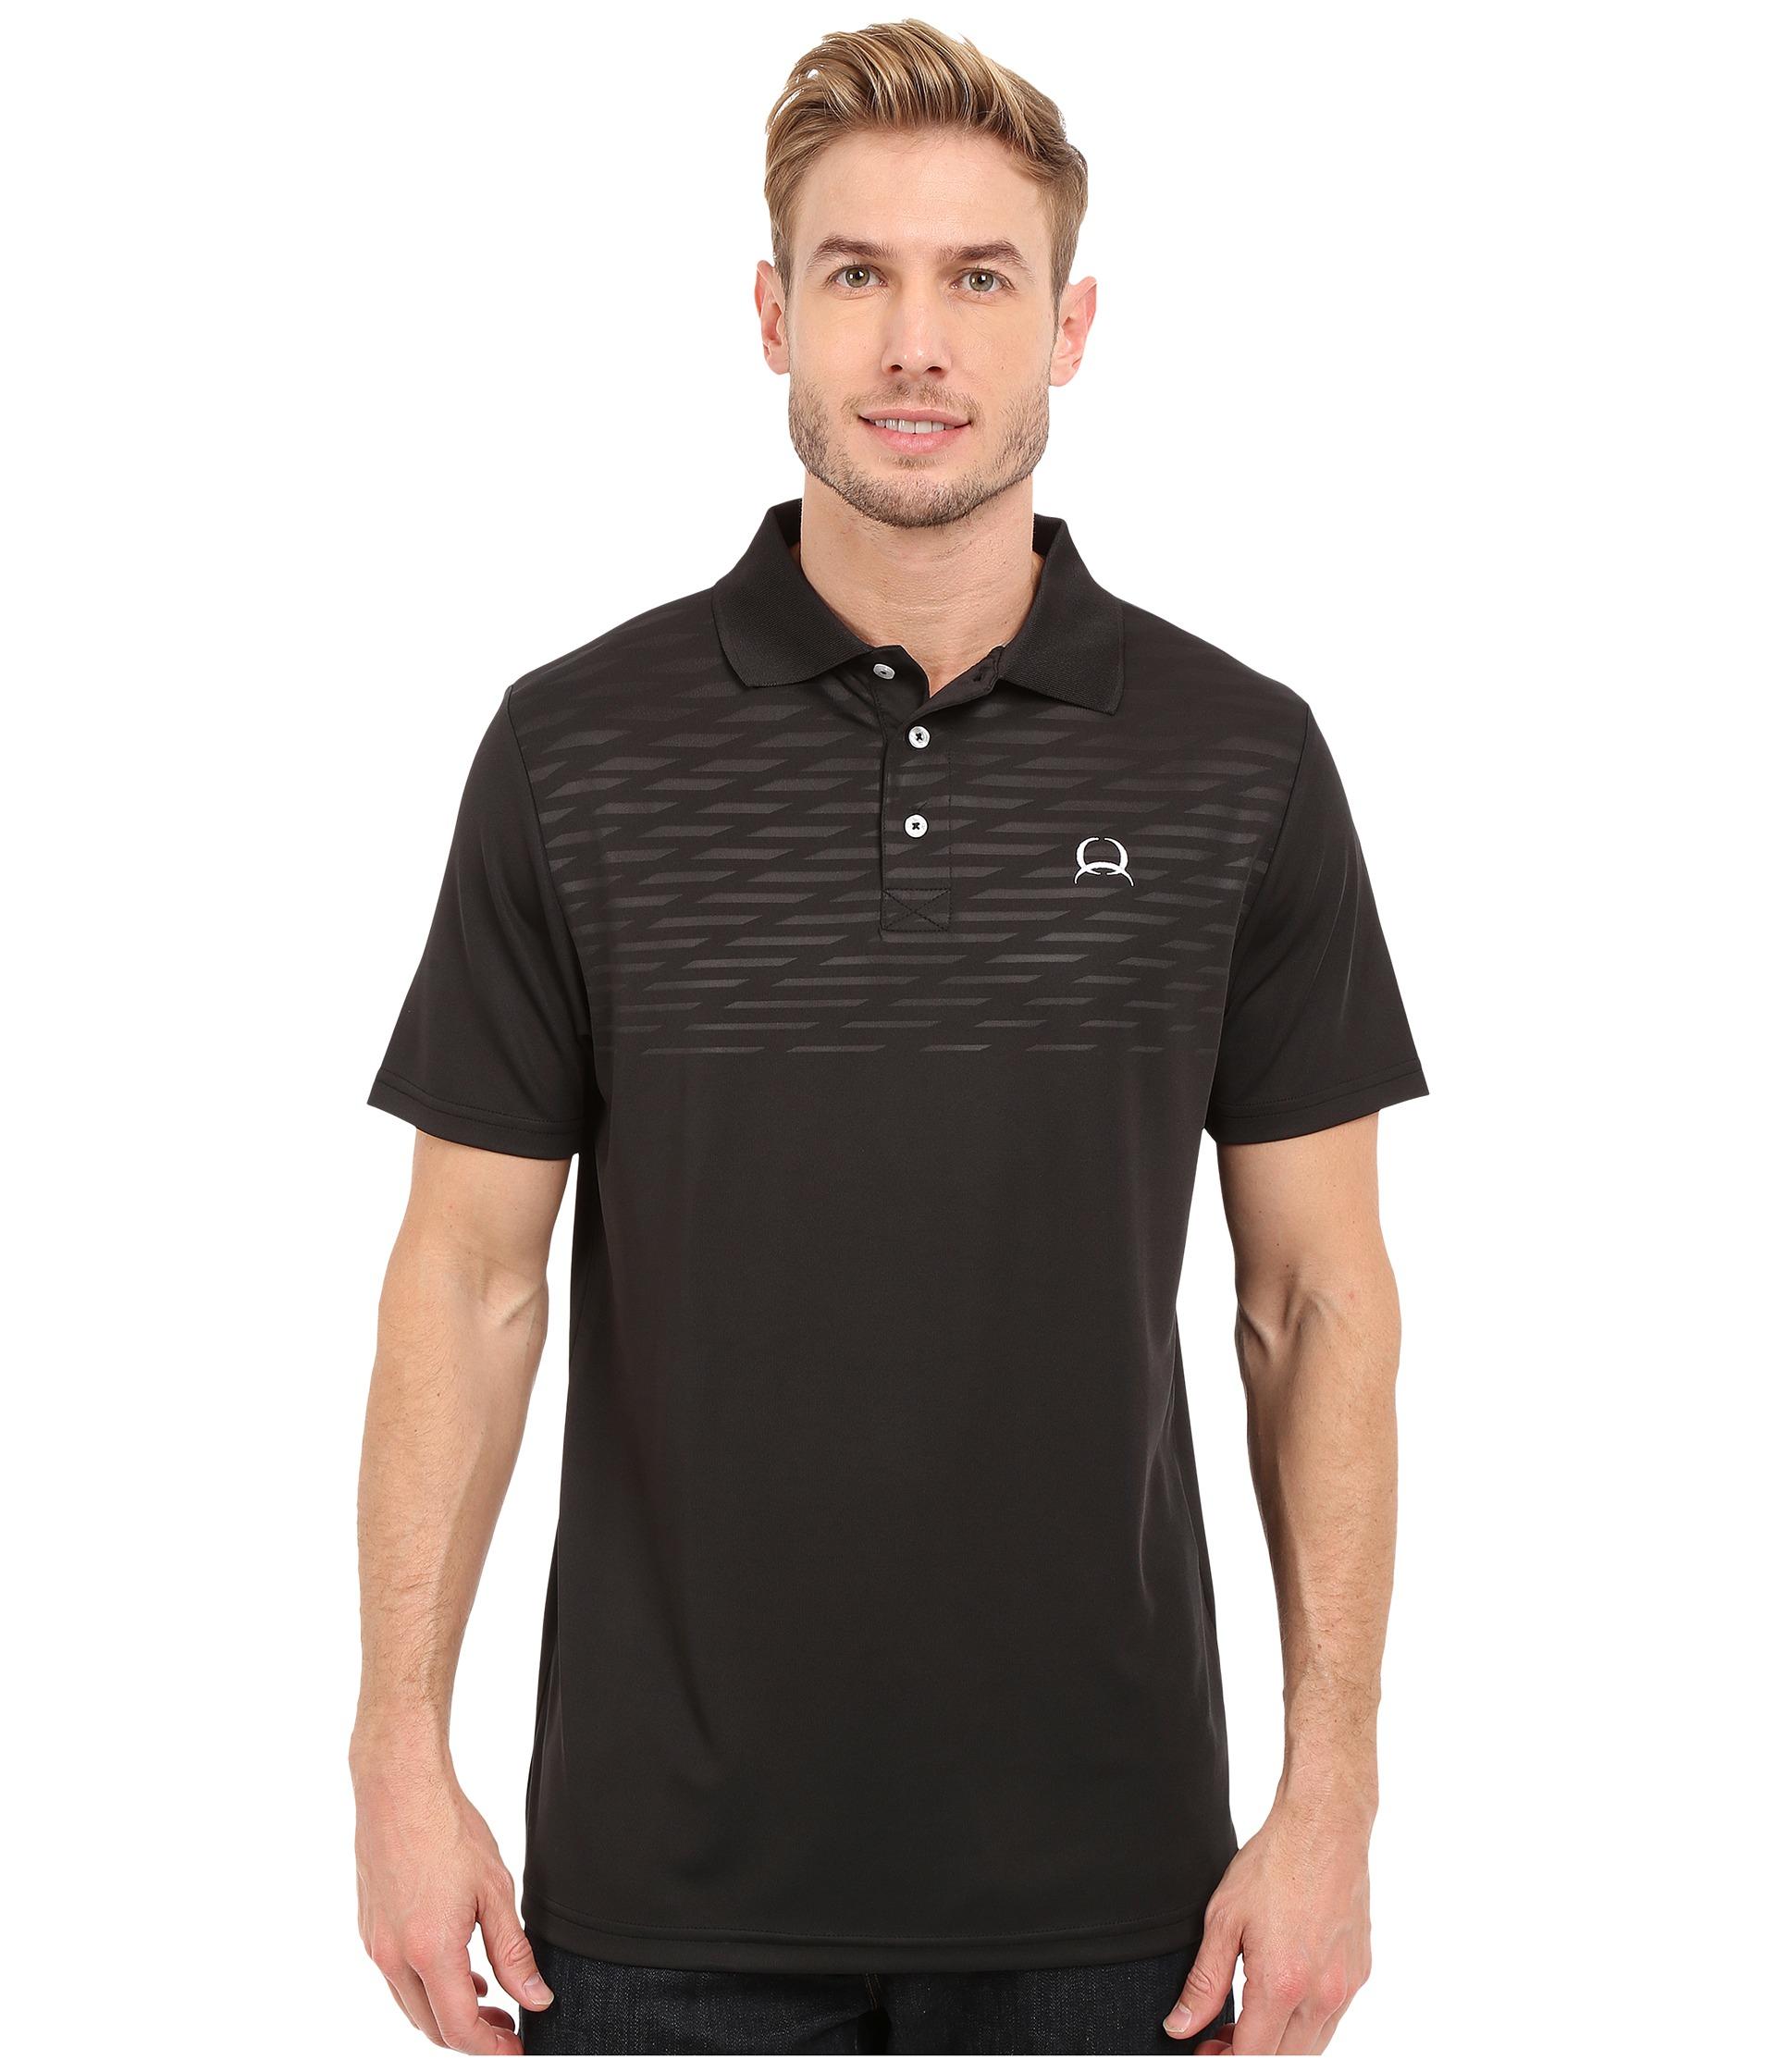 1b1e7fe0 Cinch Athletic Polo Shirts | Top Mode Depot